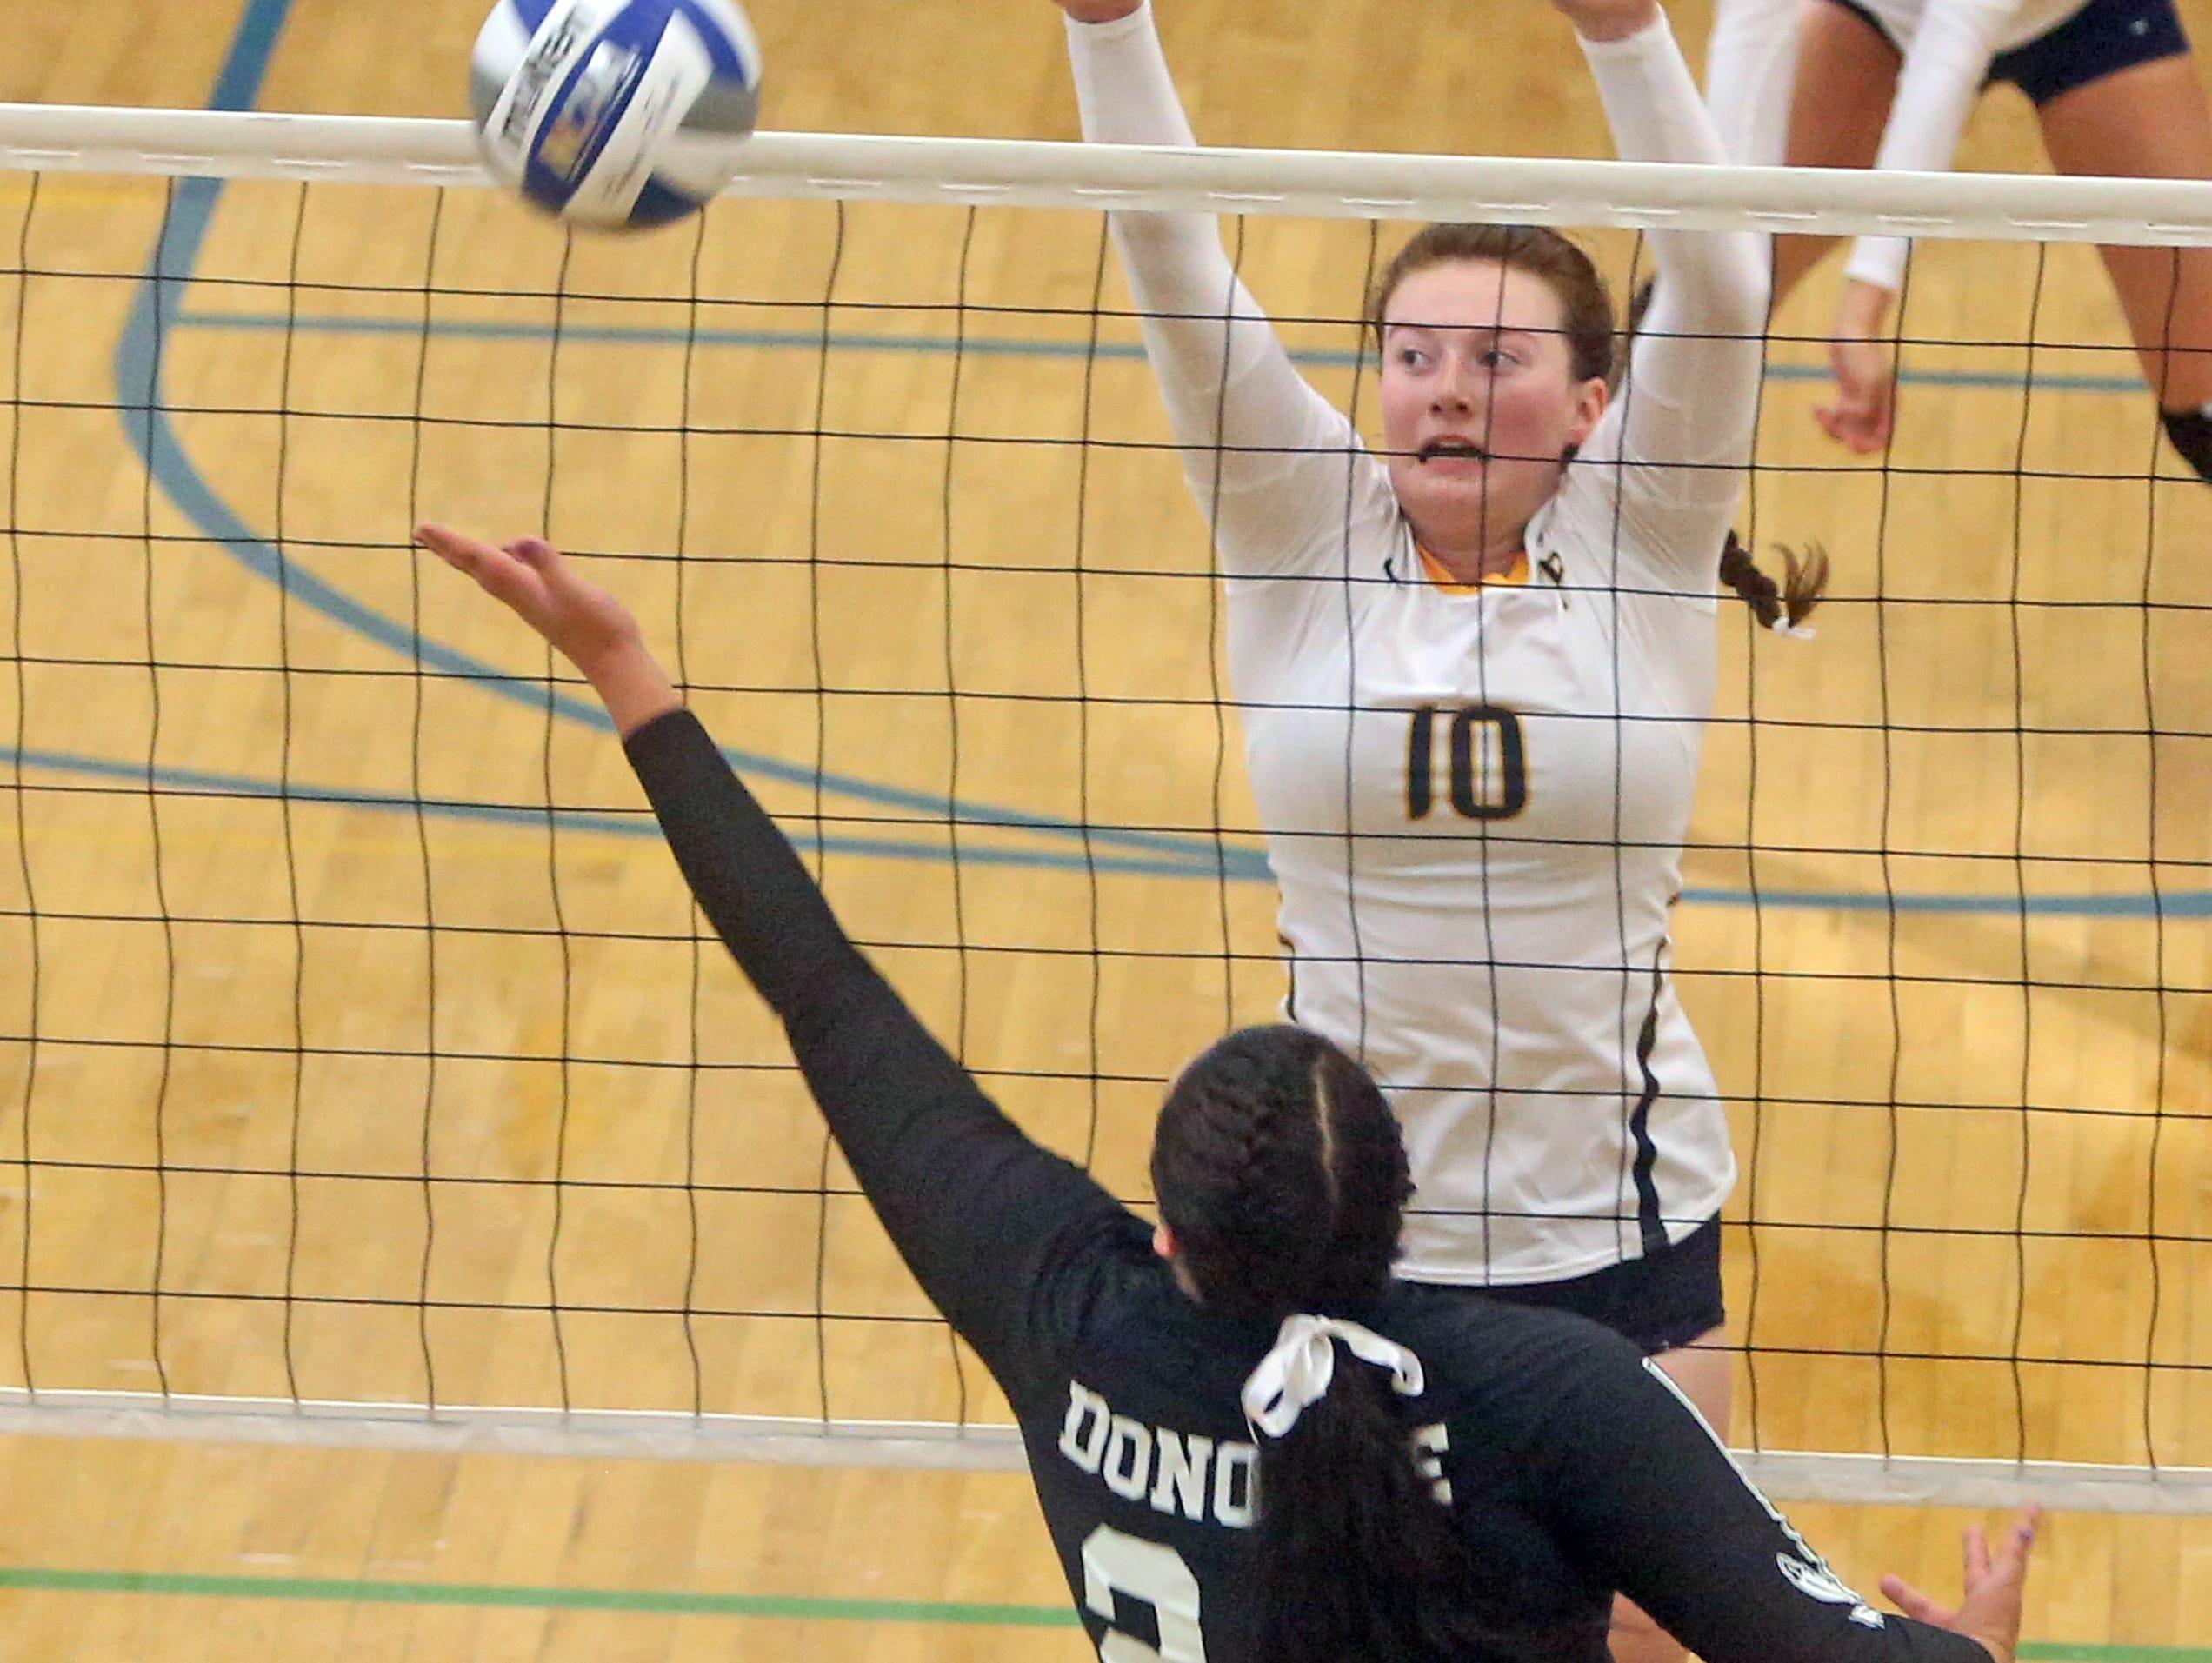 John Jay's Lauren Donohue reaches for a shot while Pelham's Alana Pettus defends during a varsity volleyball match at Pelham High School Sept. 3, 2015.